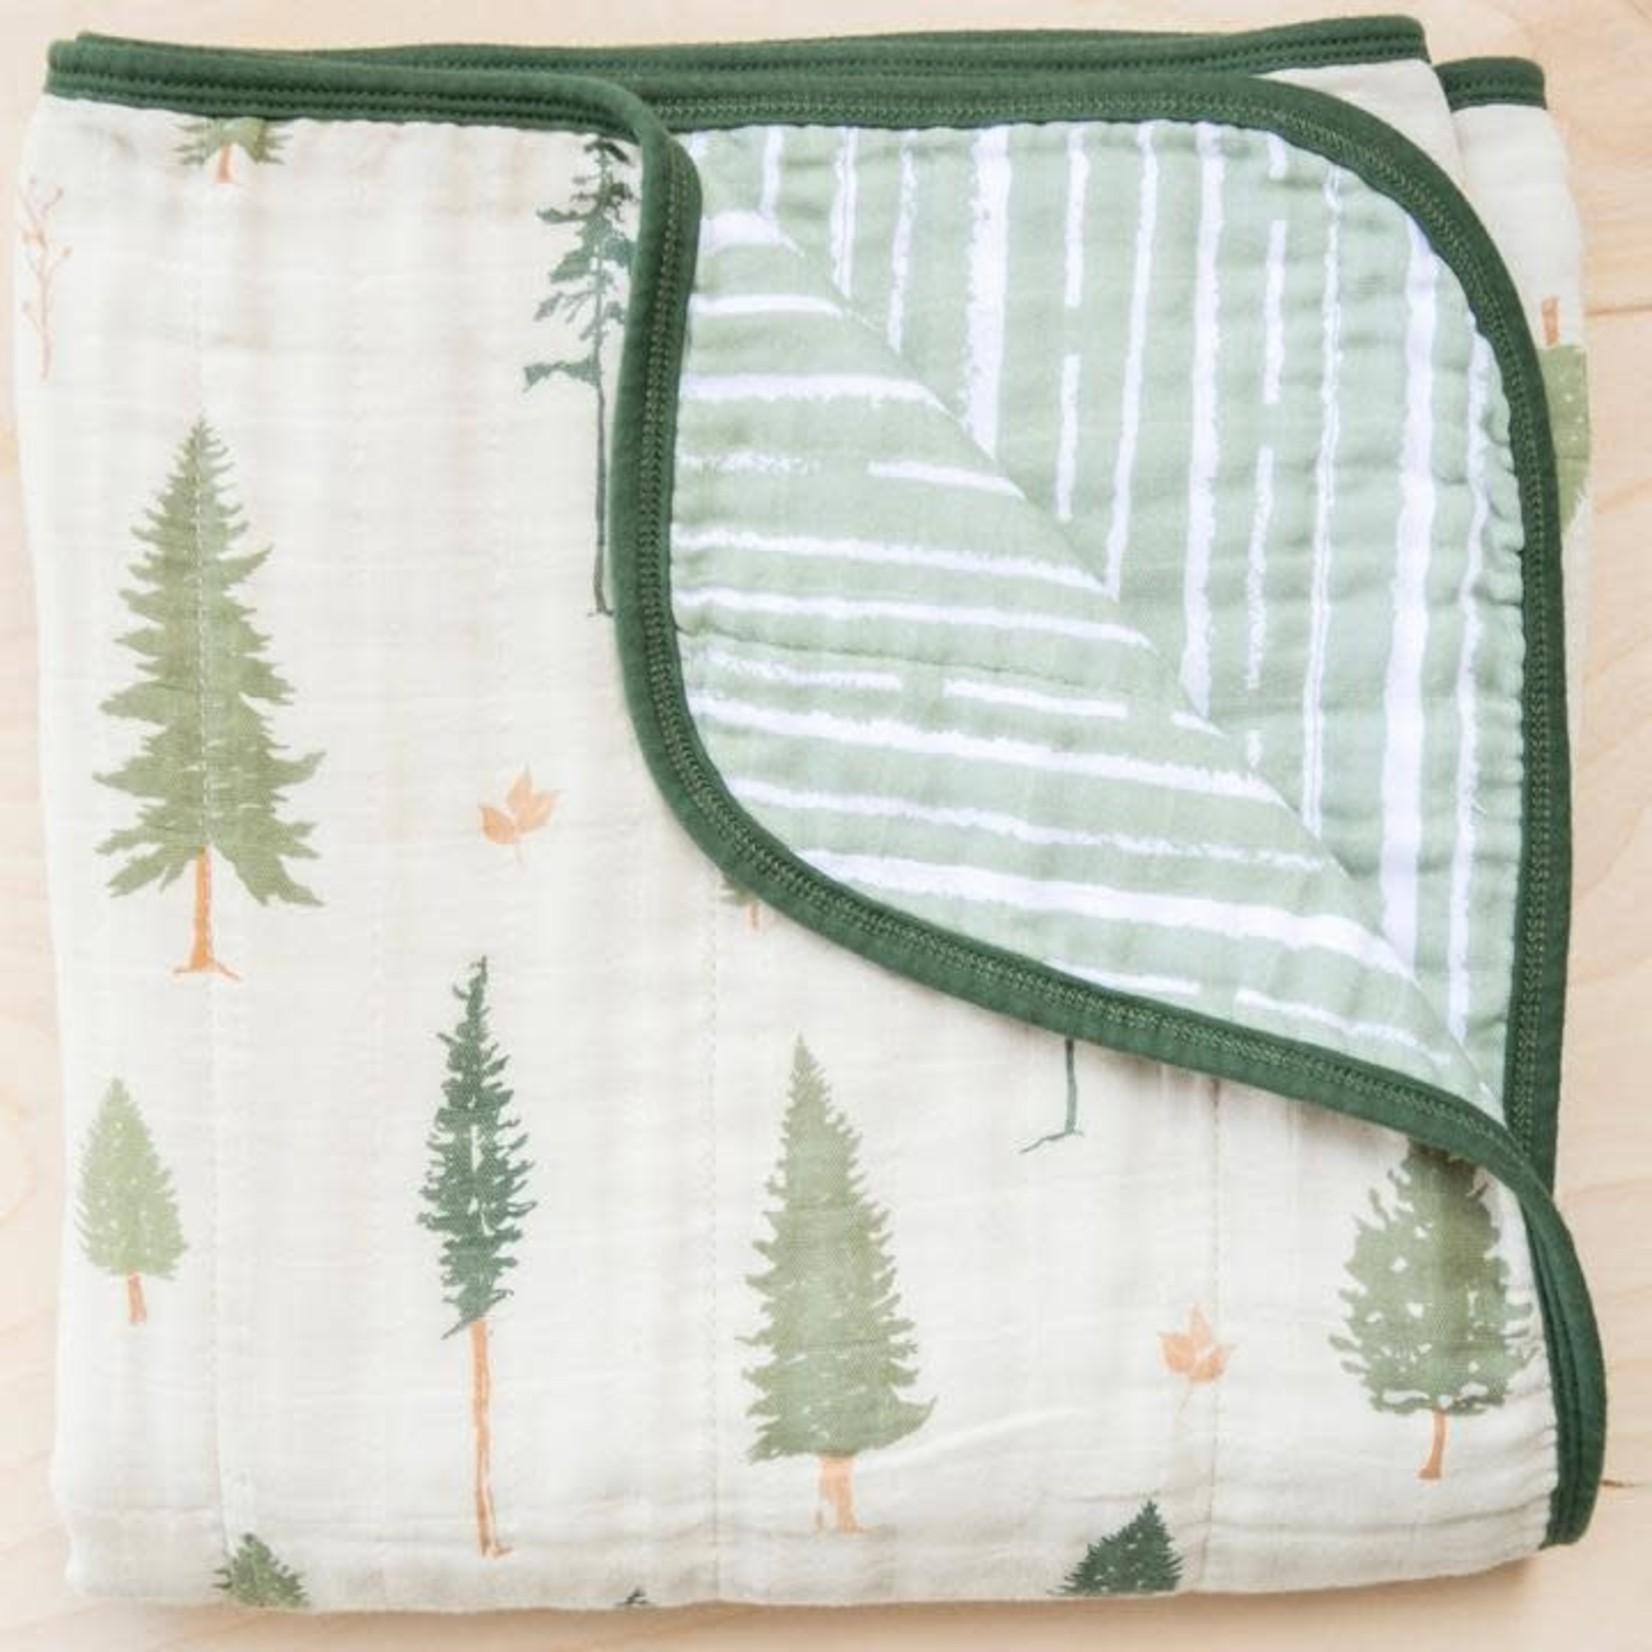 Saranoni 4-Layer Pine Cotton Muslin Quilt